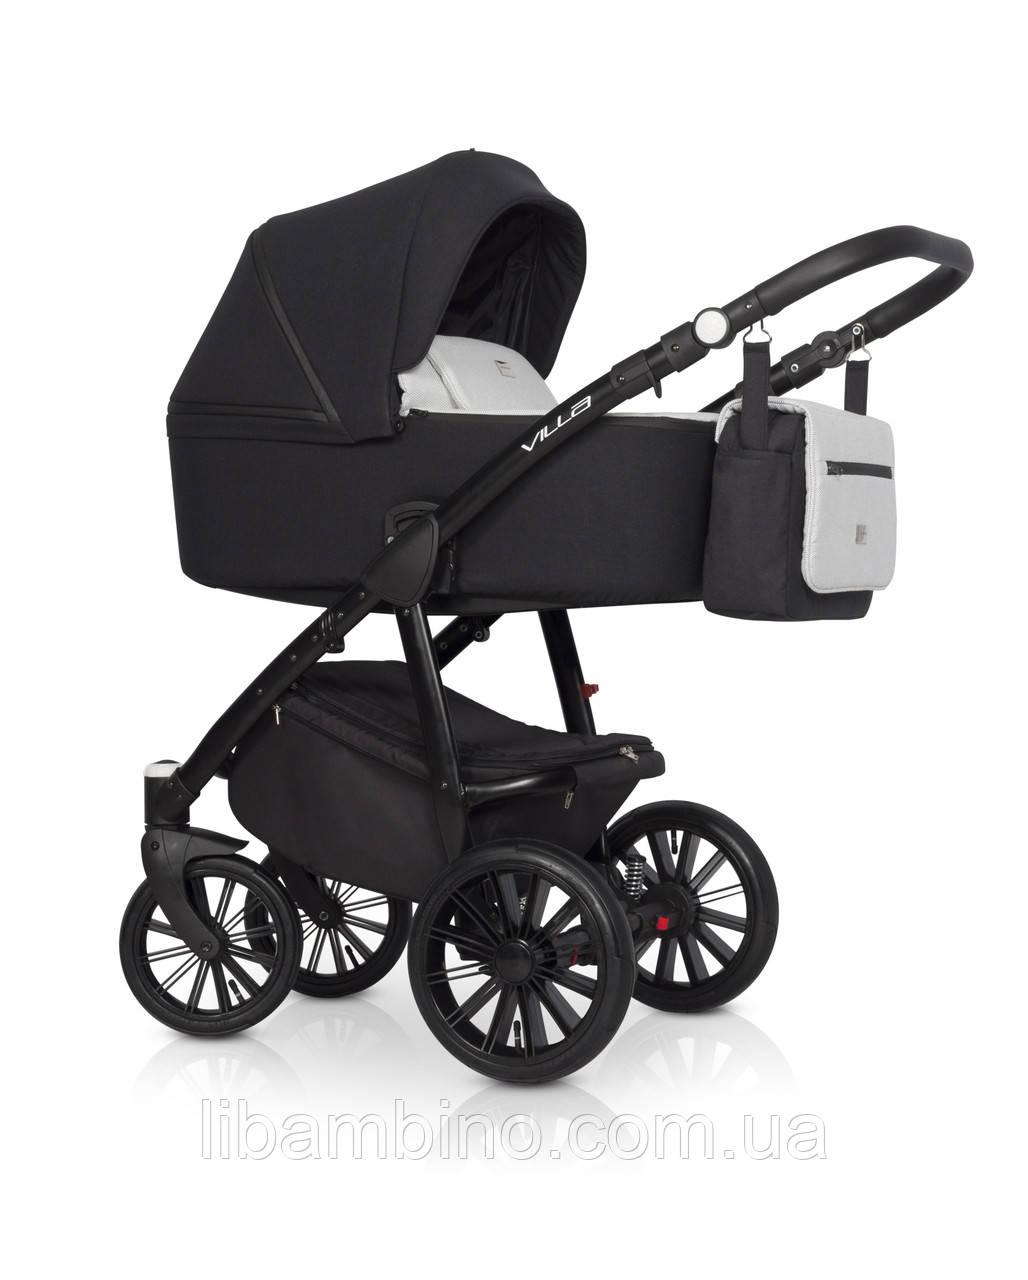 Дитяча універсальна коляска 2 в 1 Riko Villa 02 Platinum